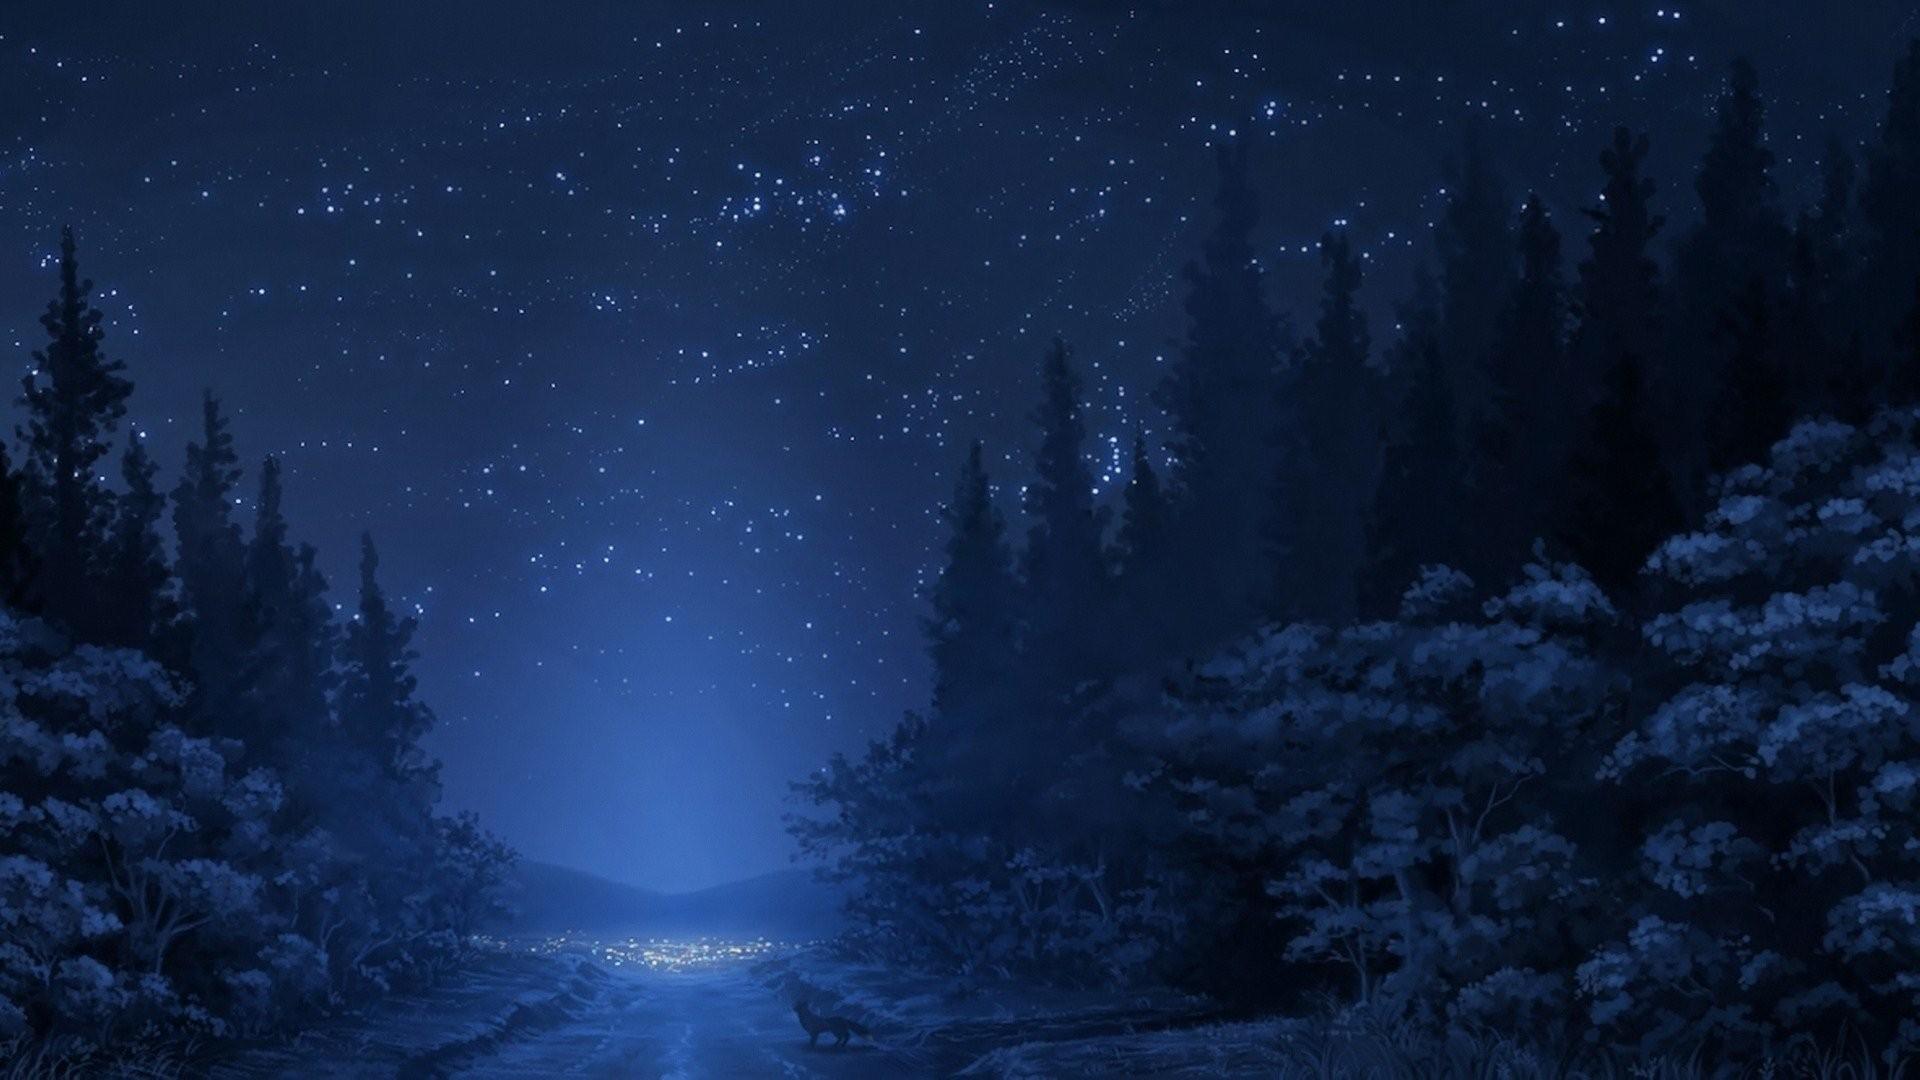 forest snow mountain road winter tree sky night star fox